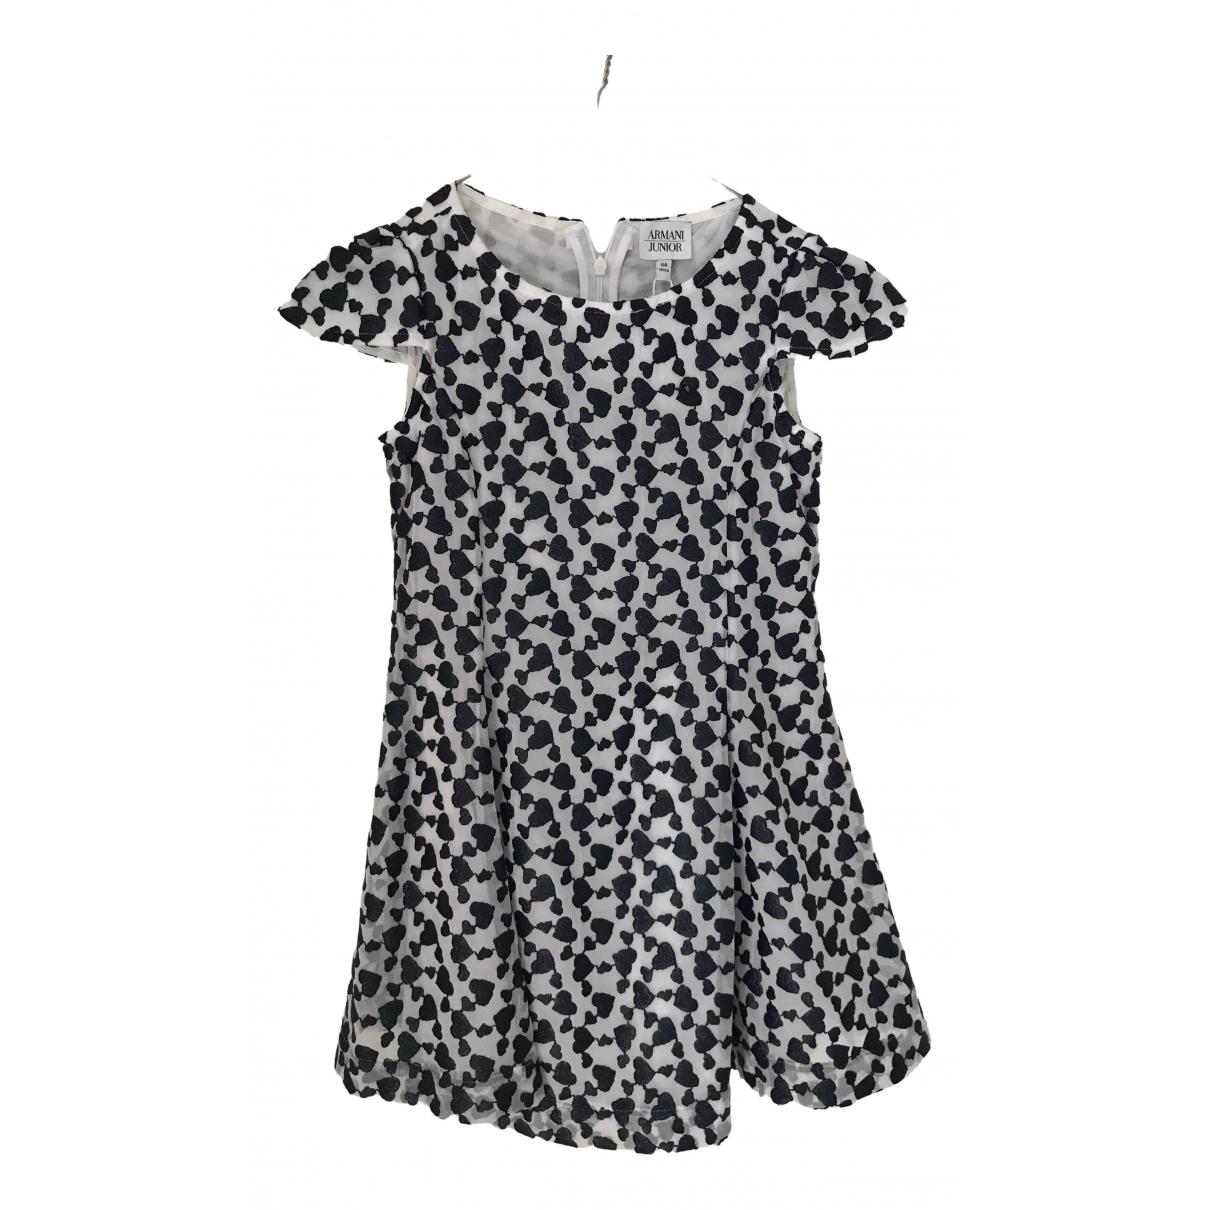 Armani Baby \N Kleid in  Bunt Polyester